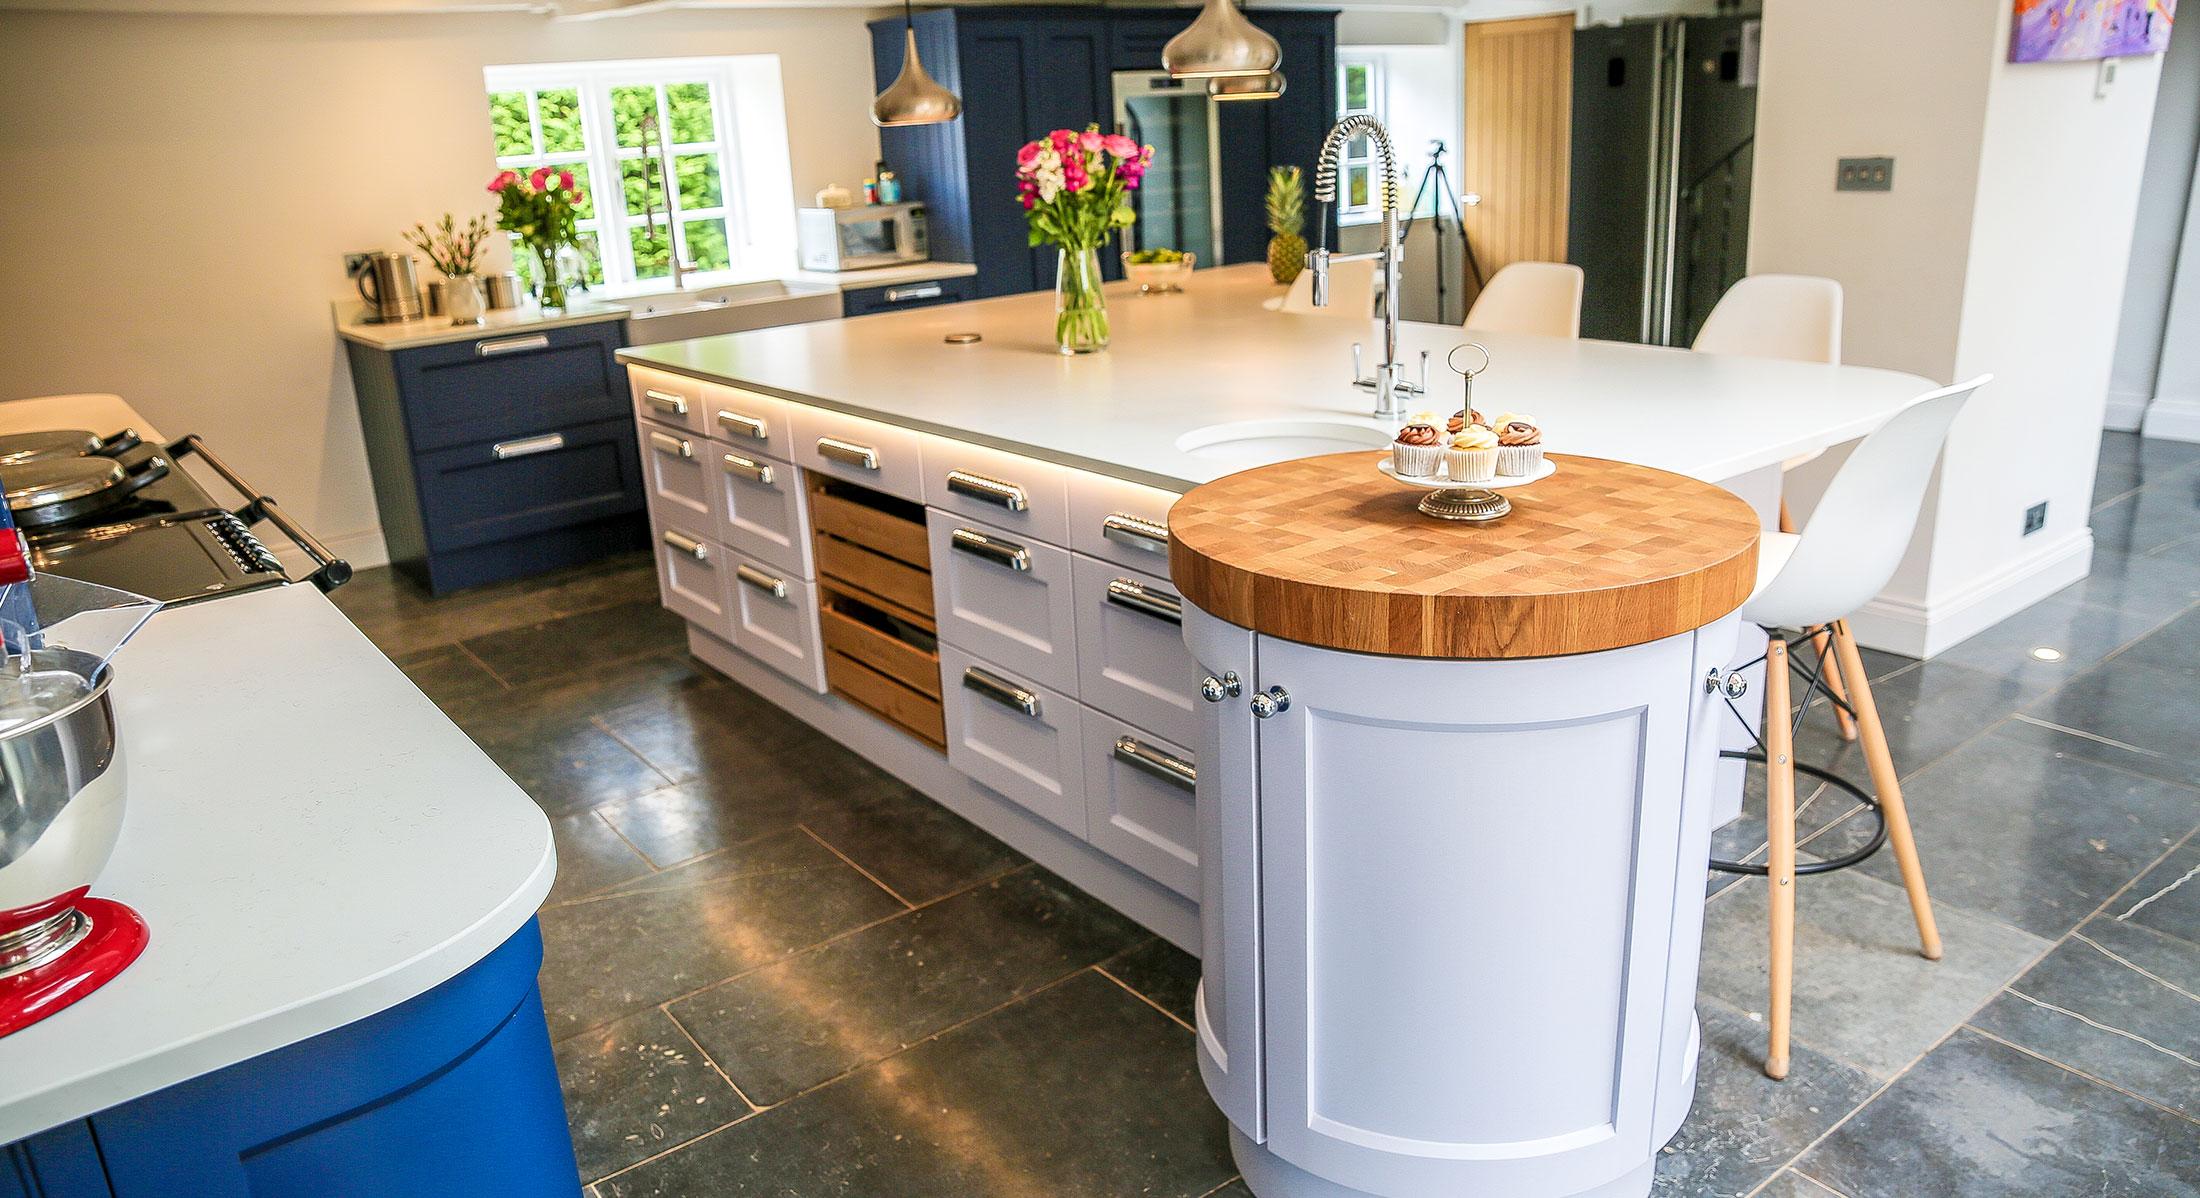 charles-yorke-kitchen-island